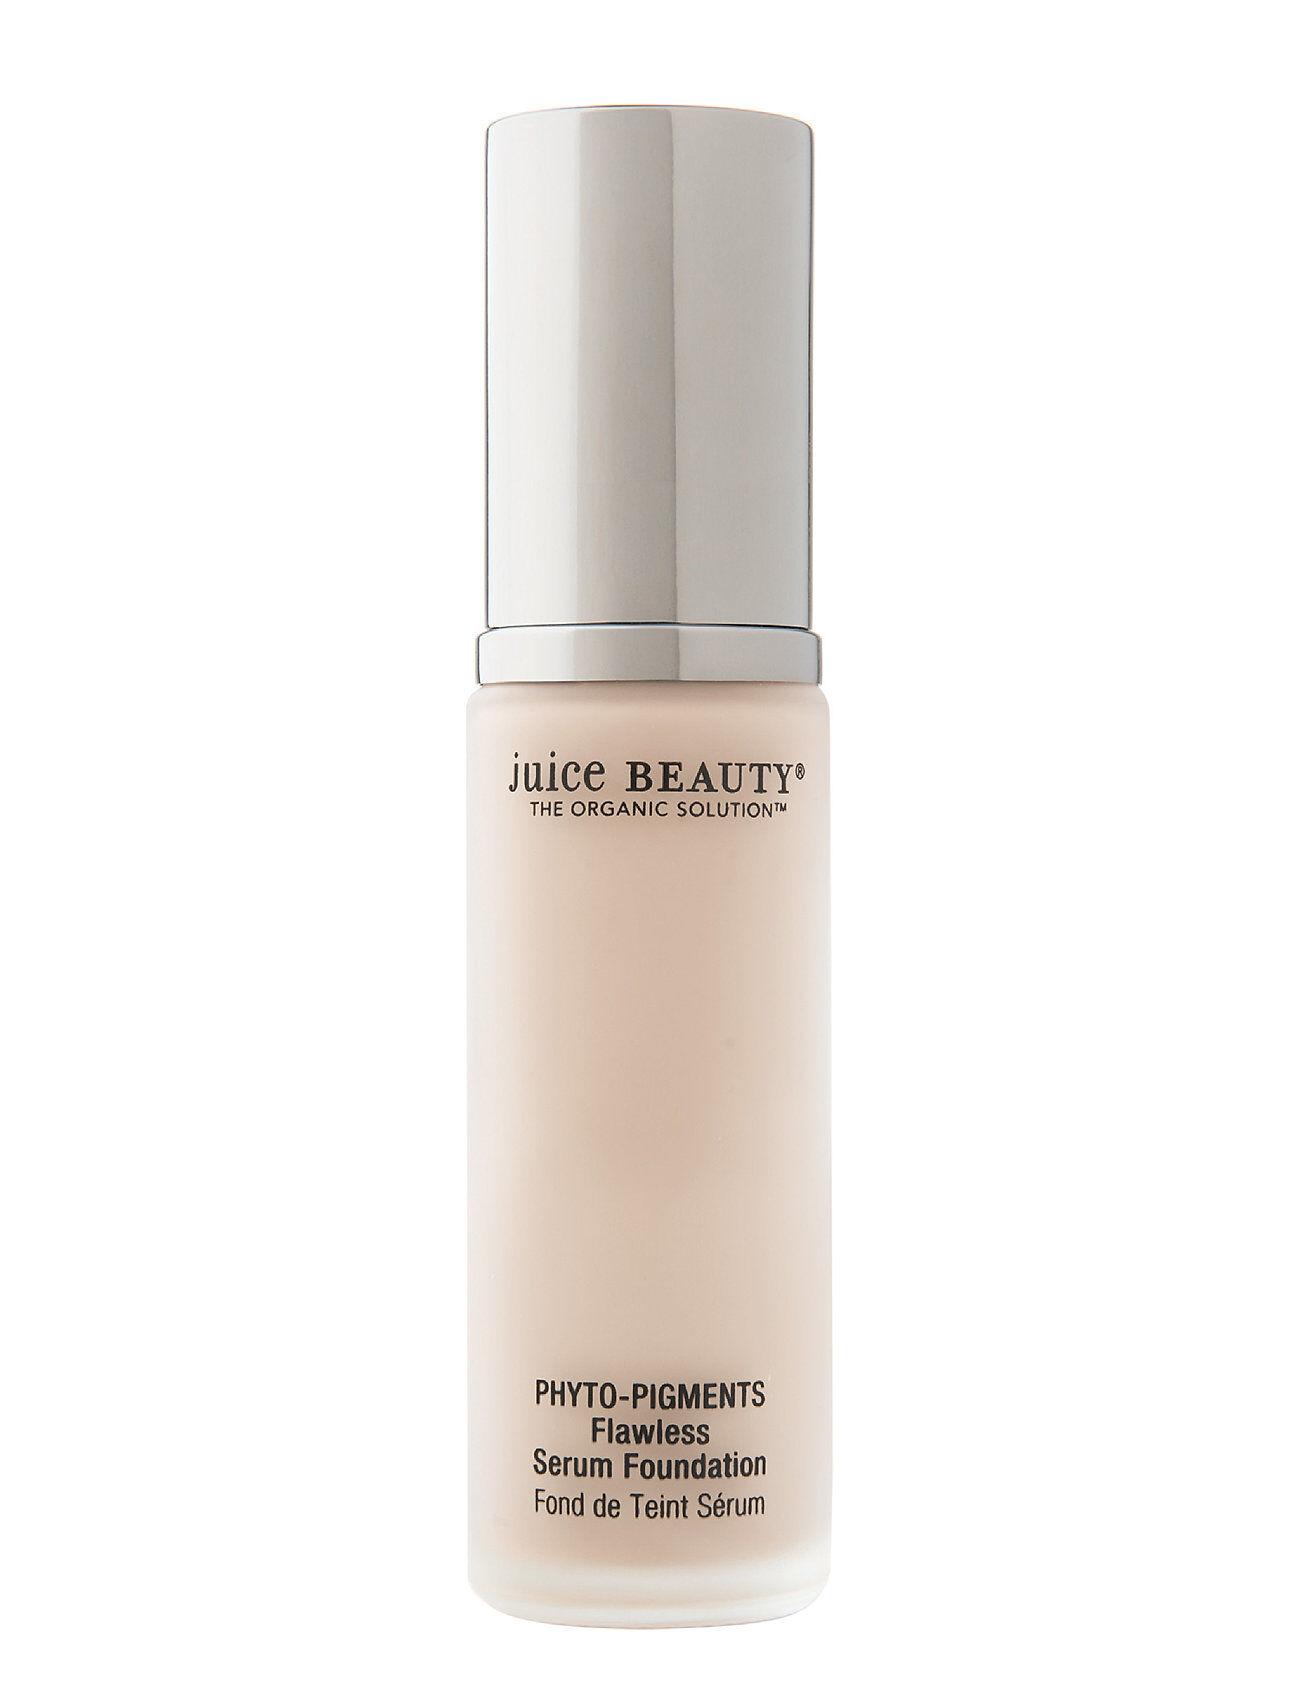 Juice Beauty Flawless Serum Foundation - 08 Cream